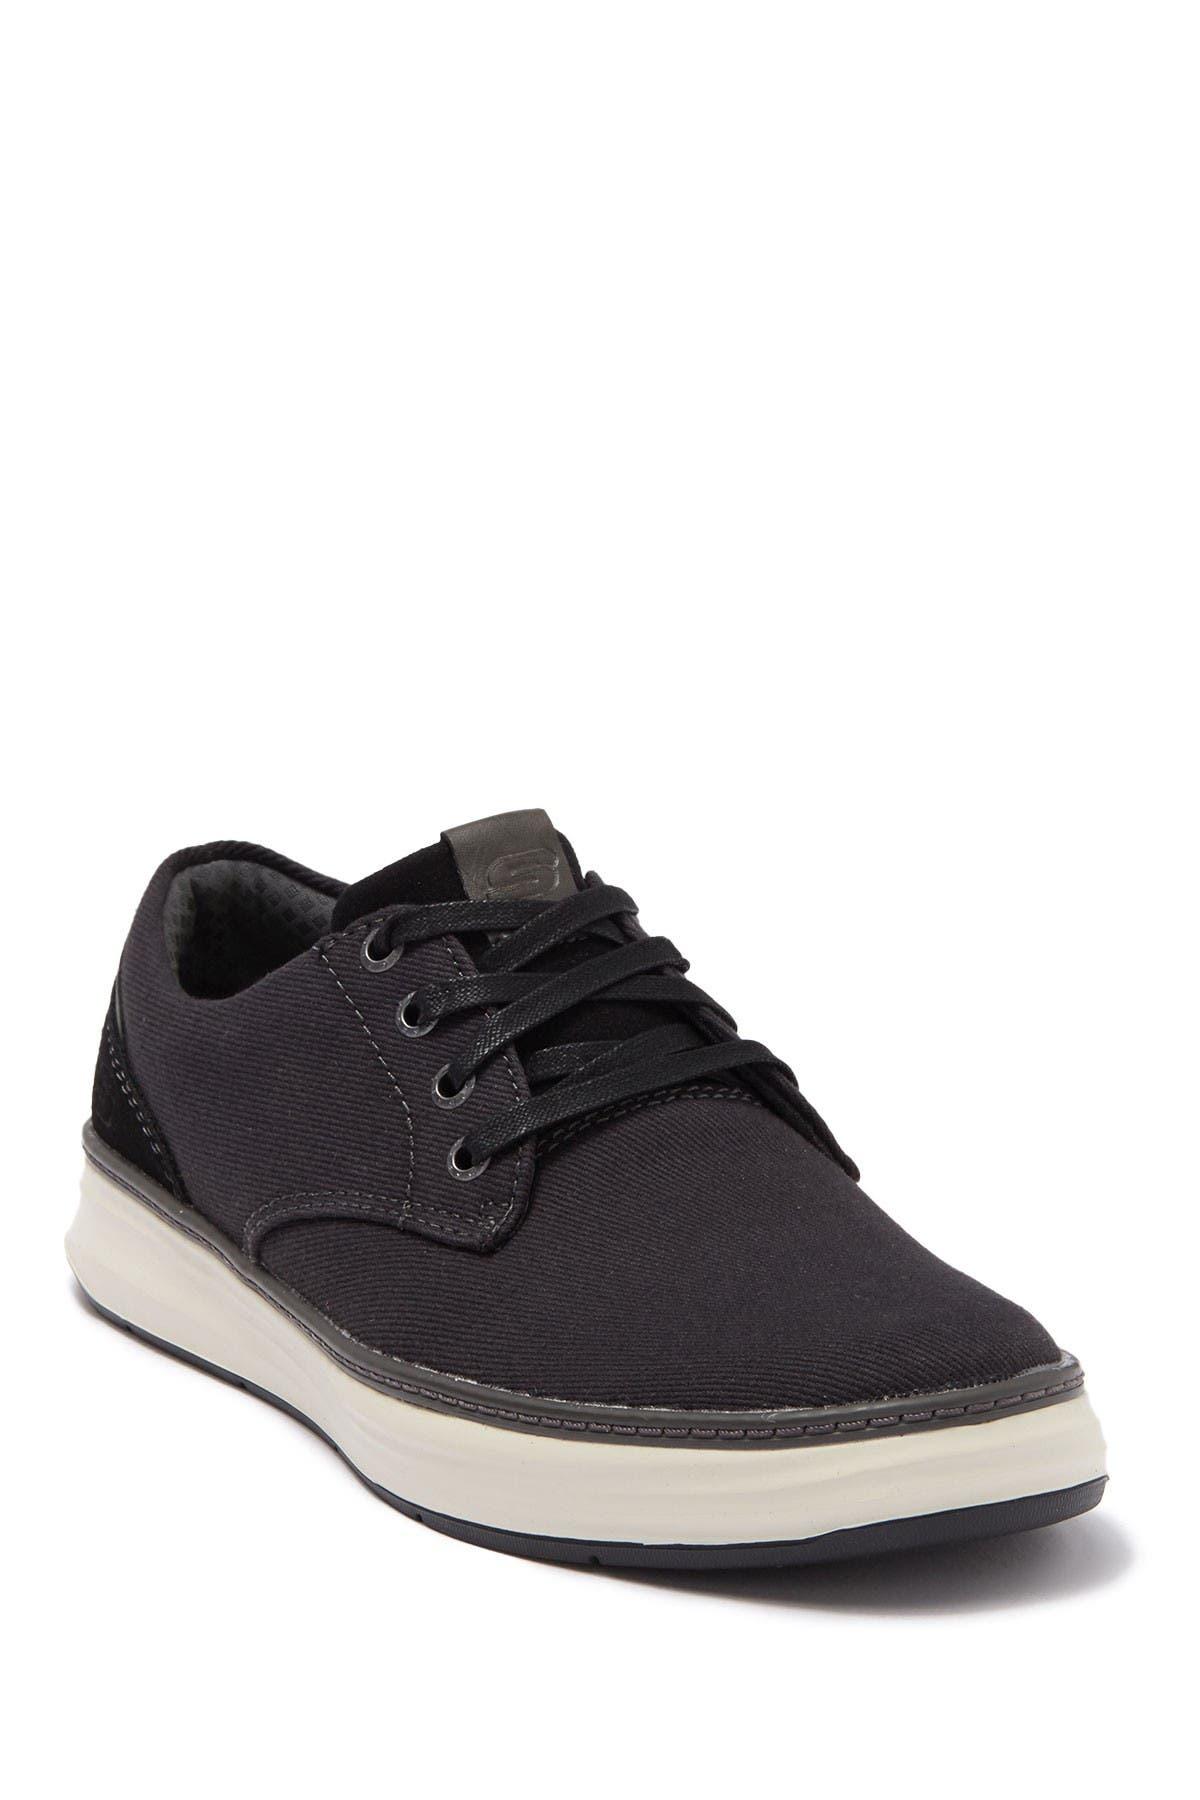 Image of Skechers Moreno Ederson Sneaker